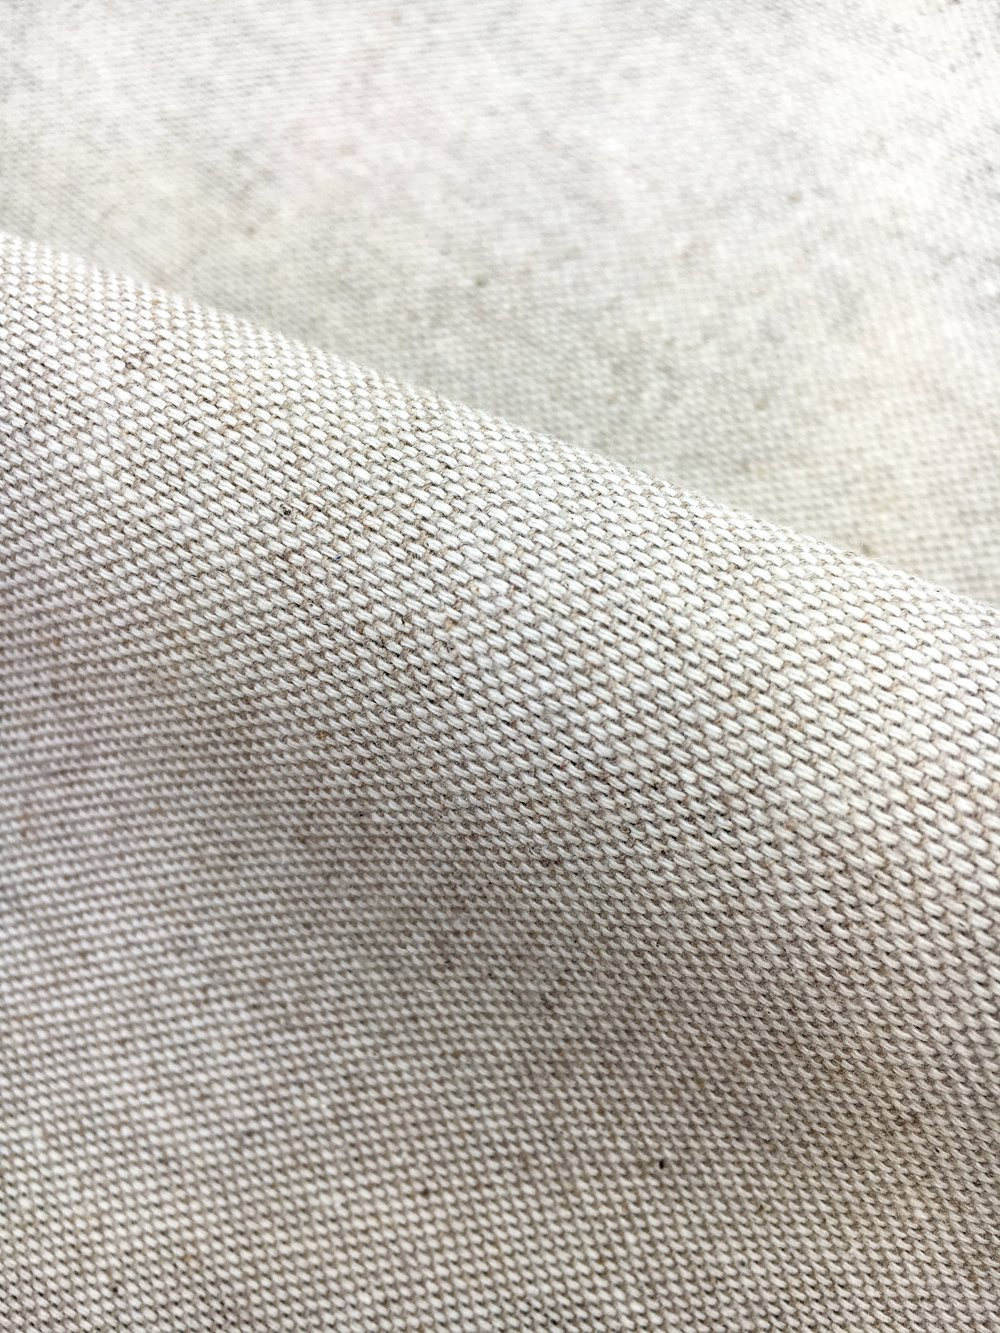 CottonFabricPlain3.jpg